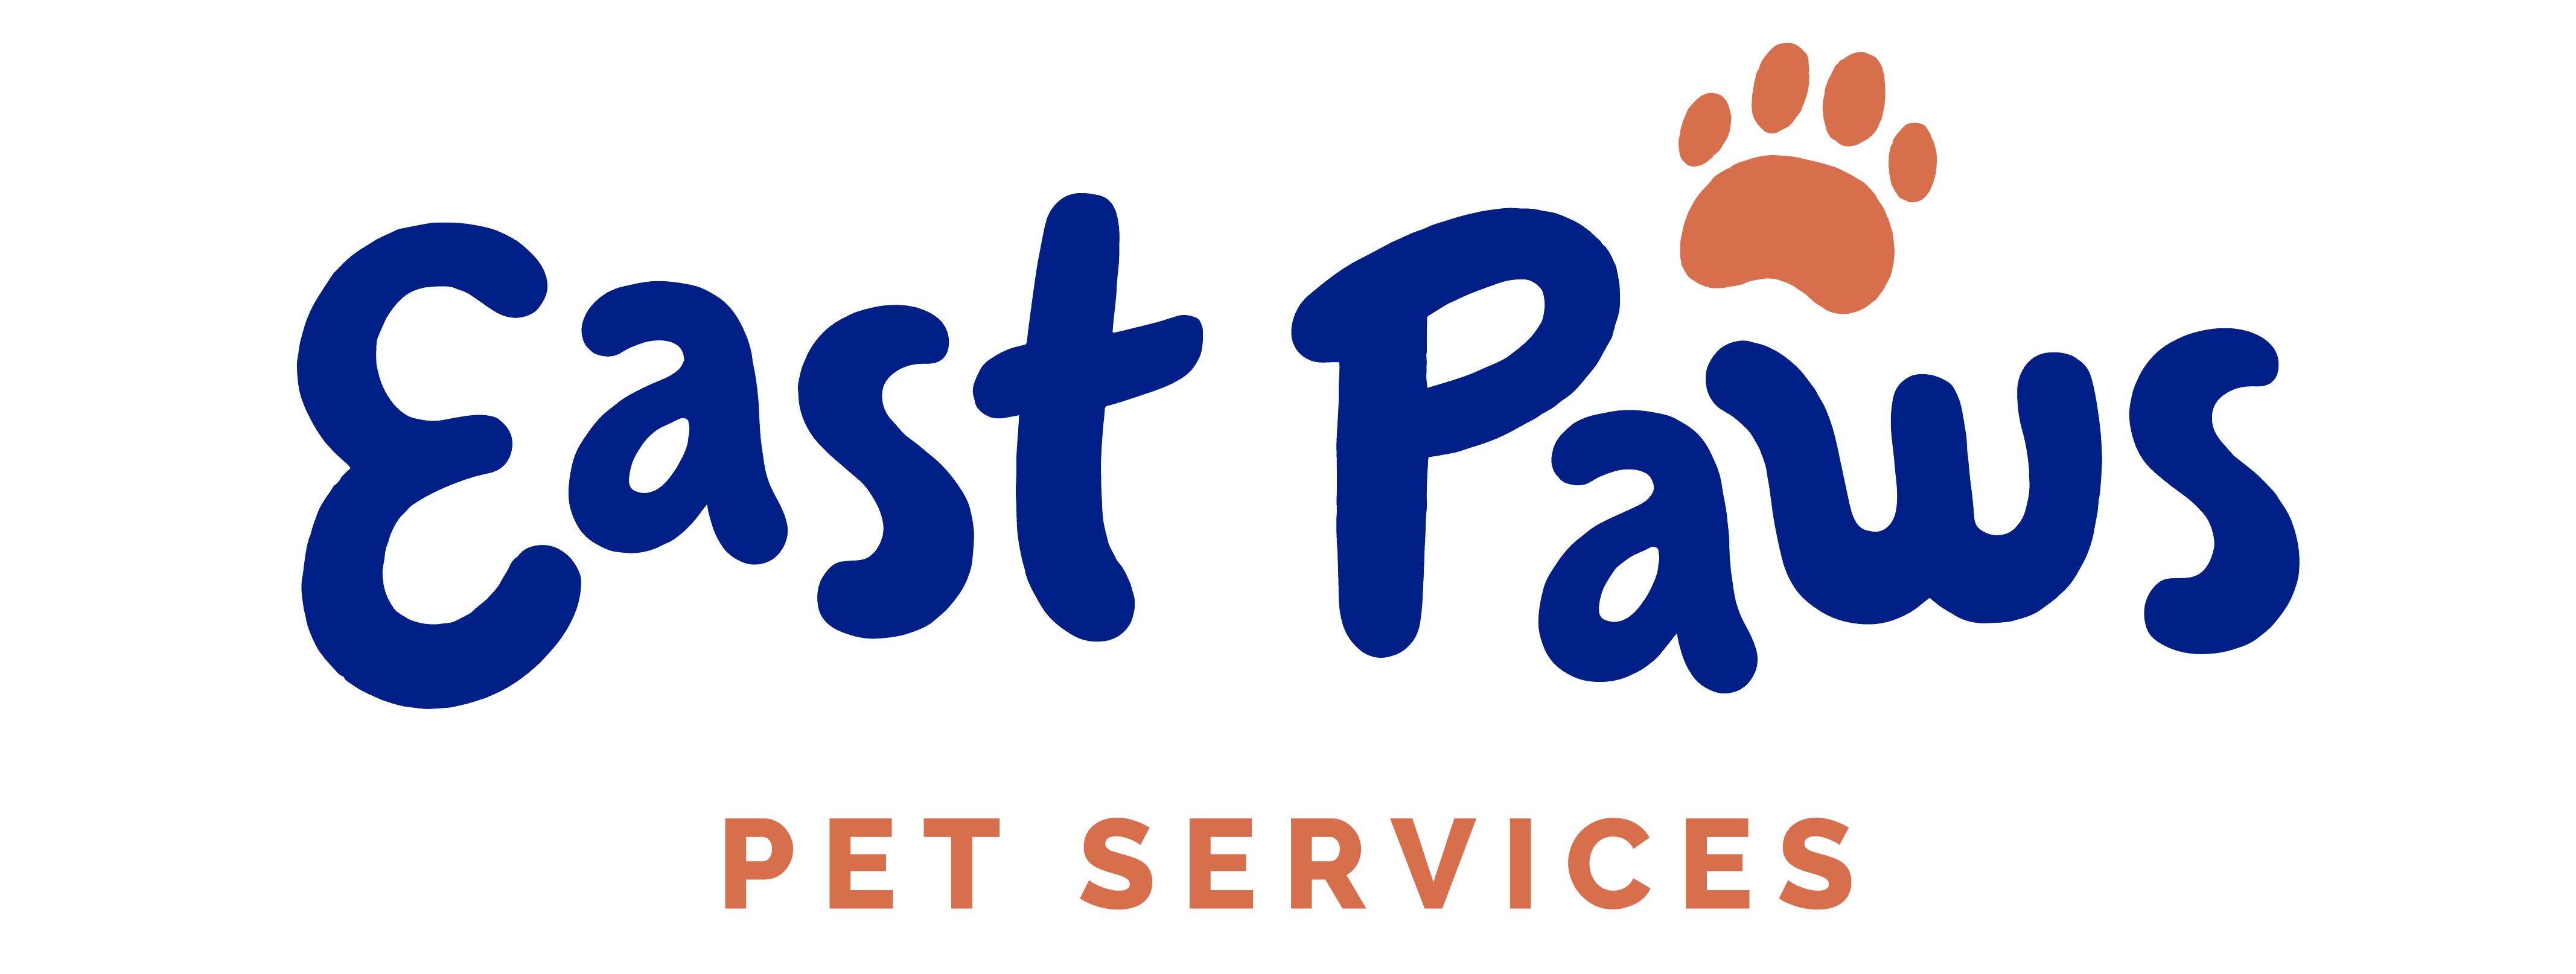 East Paws Pet Services